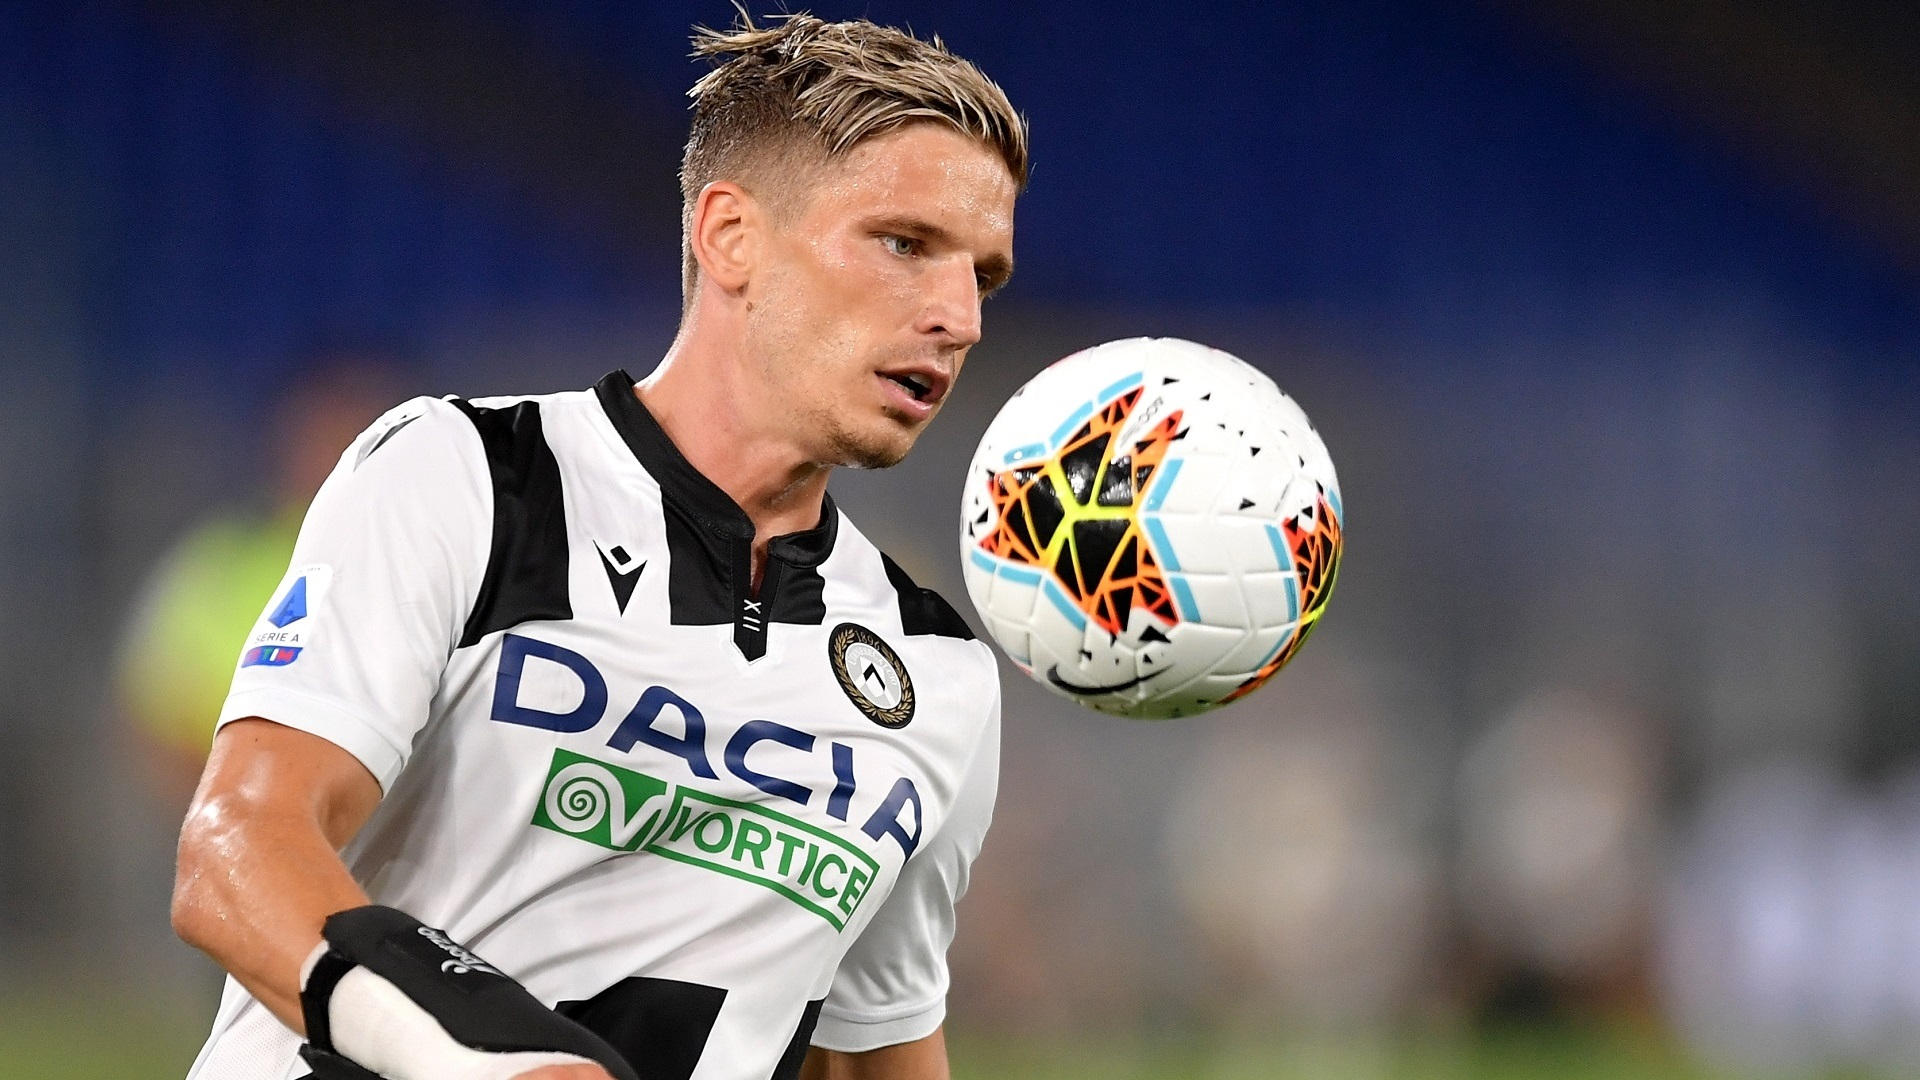 Udinese, Stryger-Larsen operato: i tempi di recupero - Virgilio Sport